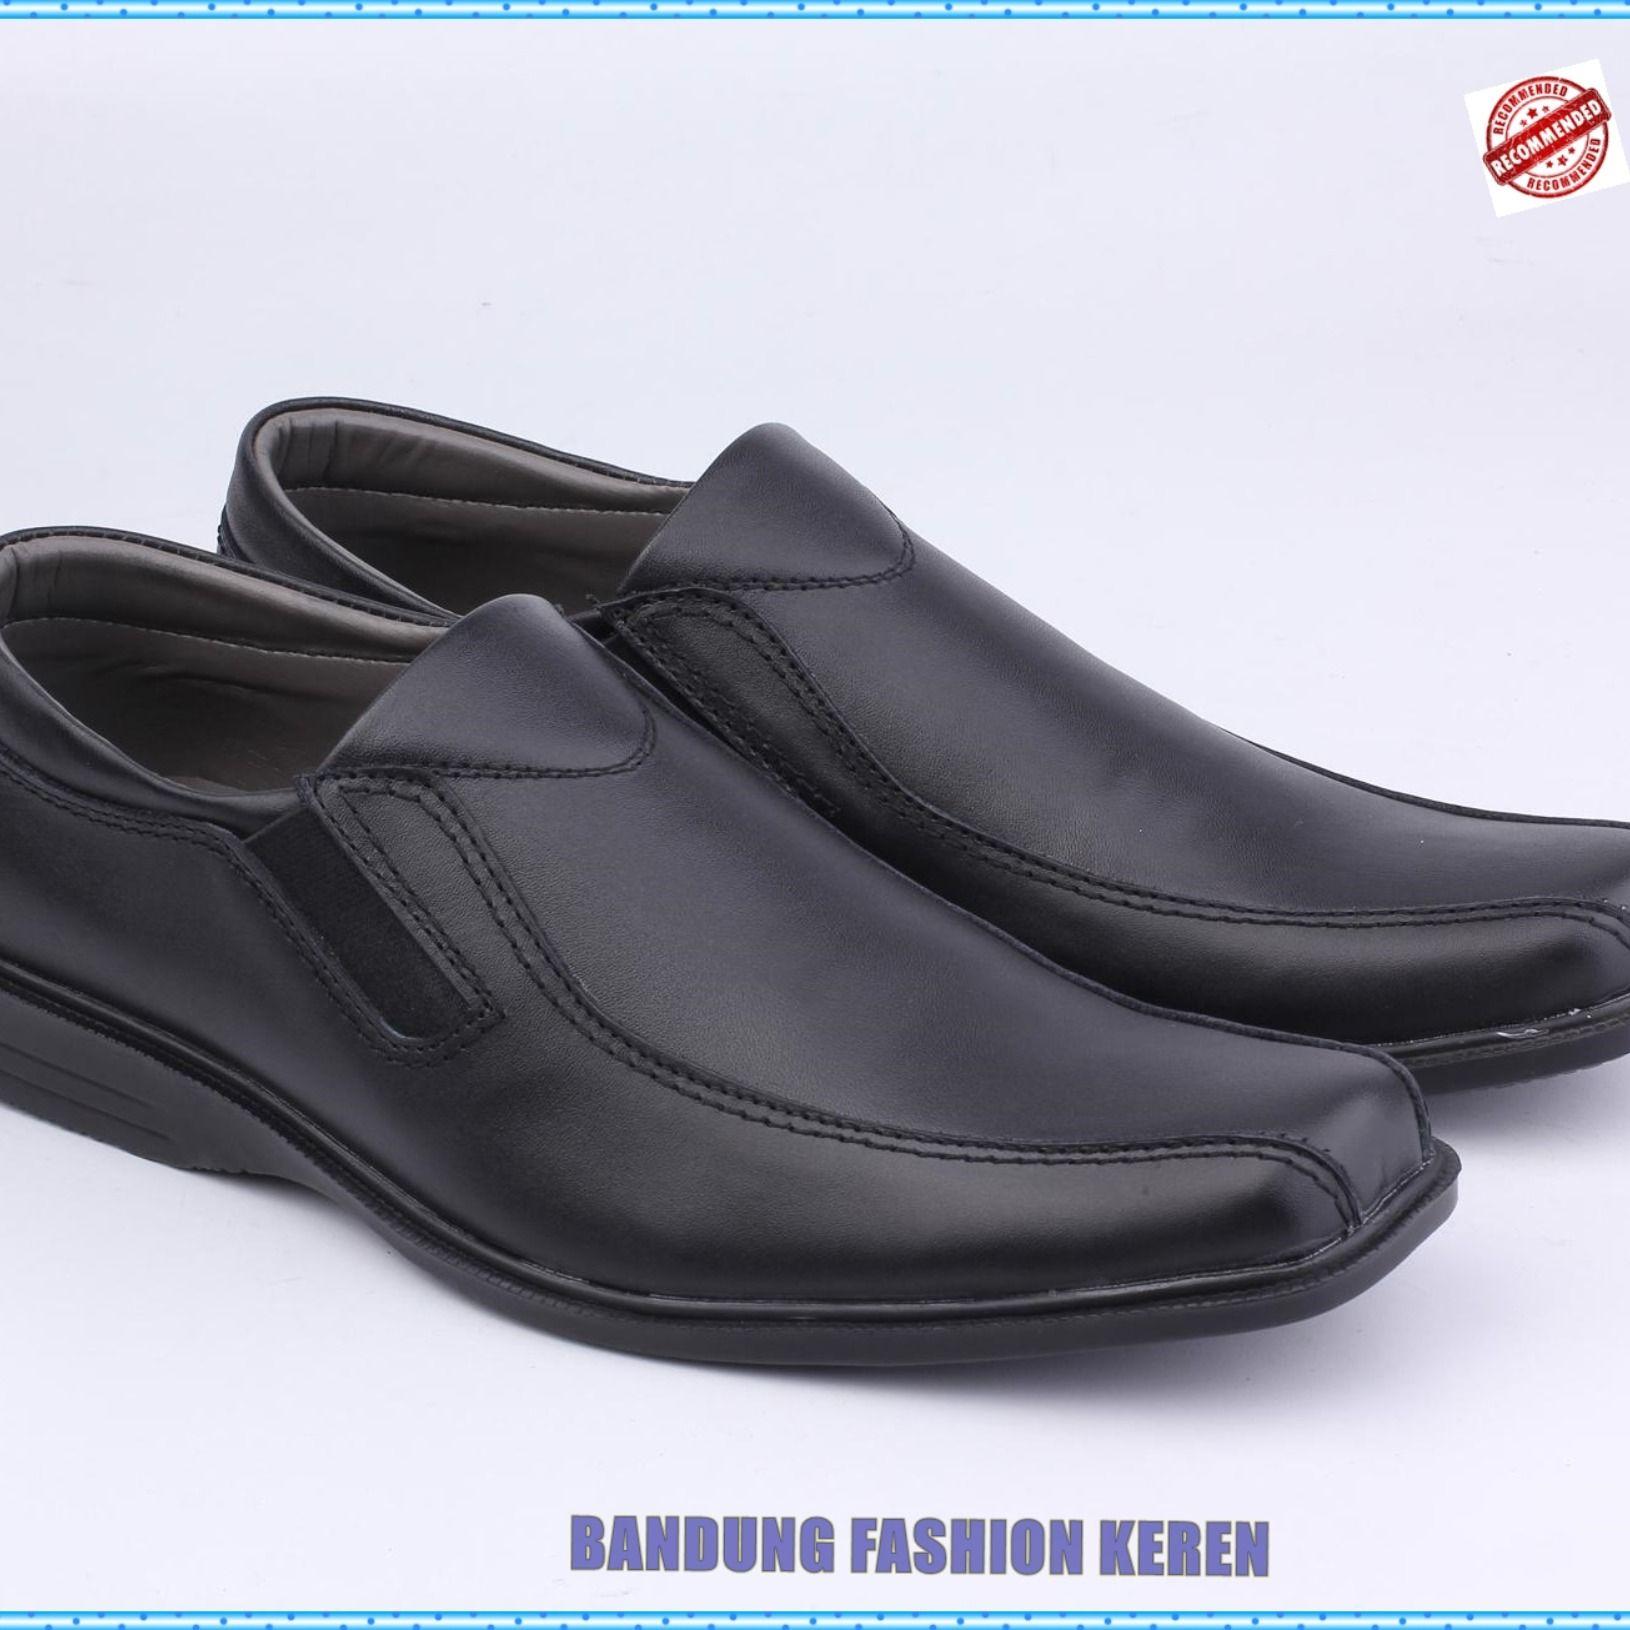 Sepatu Formil Pria Mp 093 Produk Fashion Handmade Terbaik 100